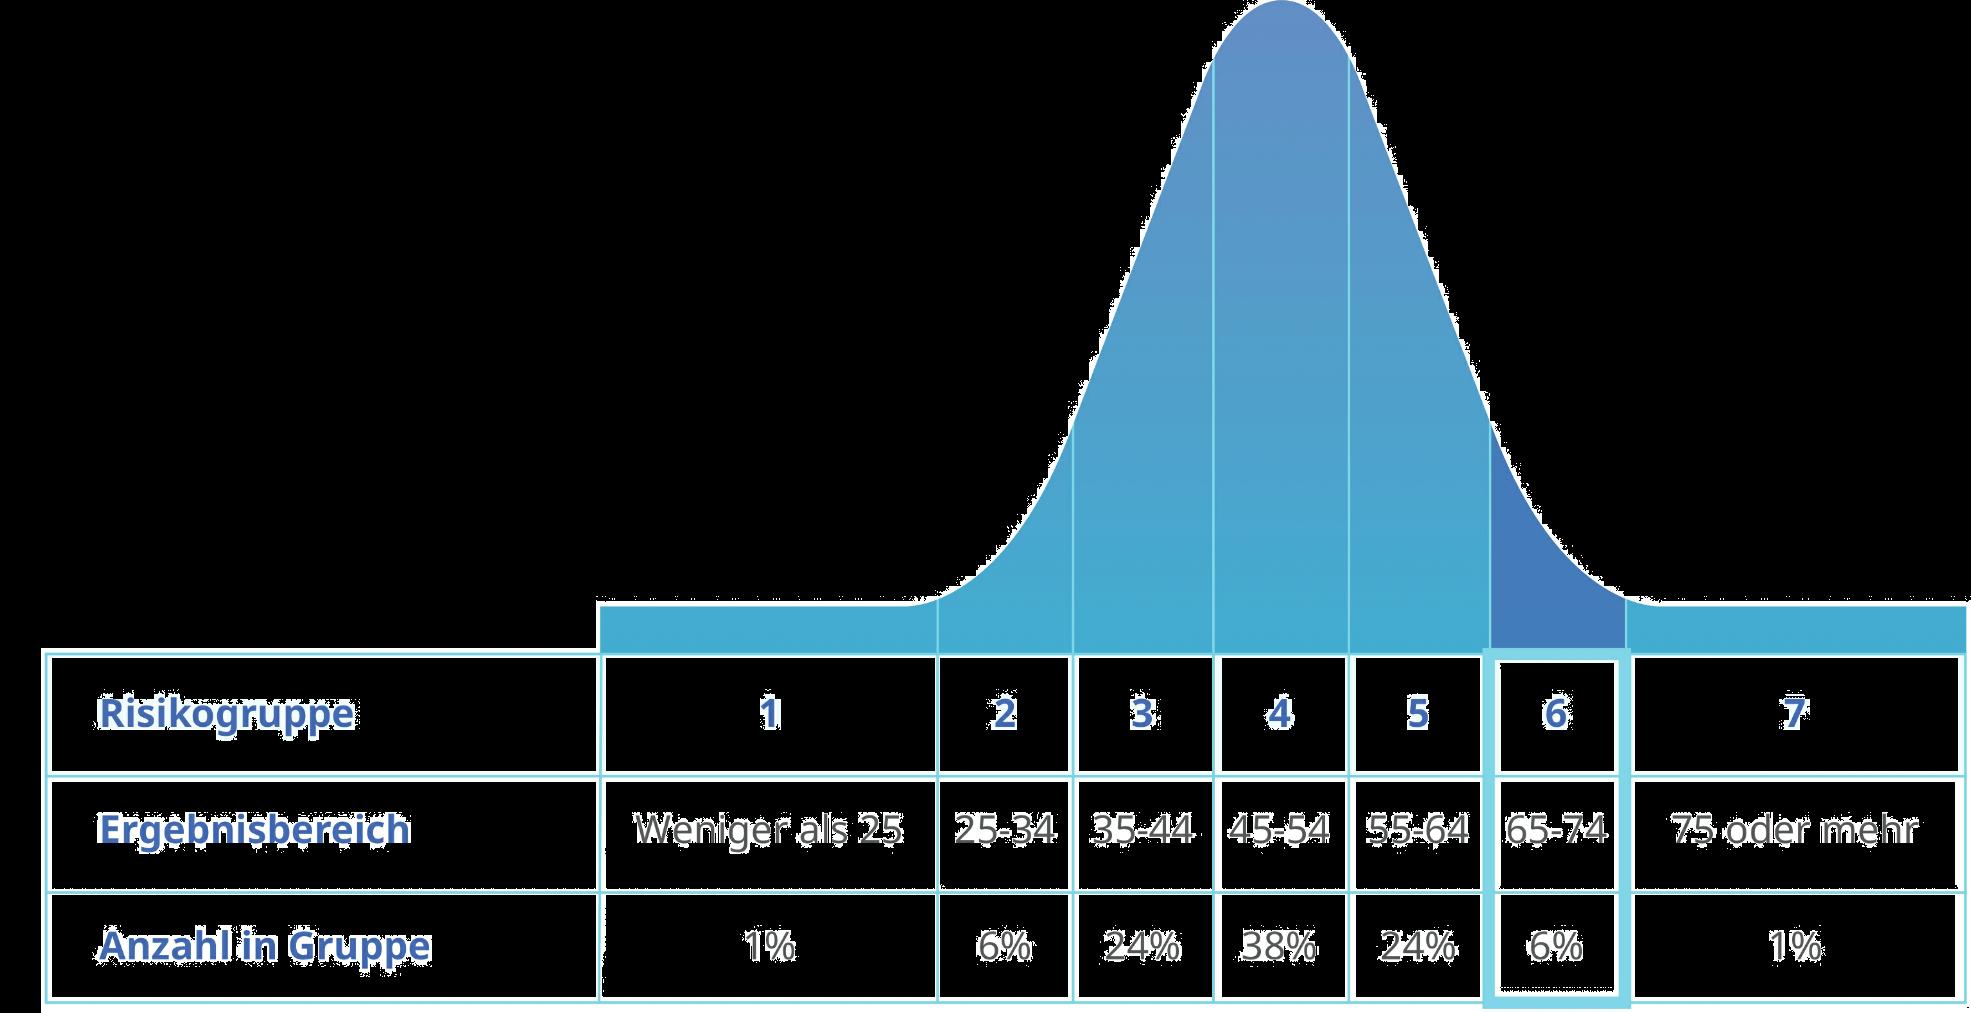 Finametrica Risikoneigung